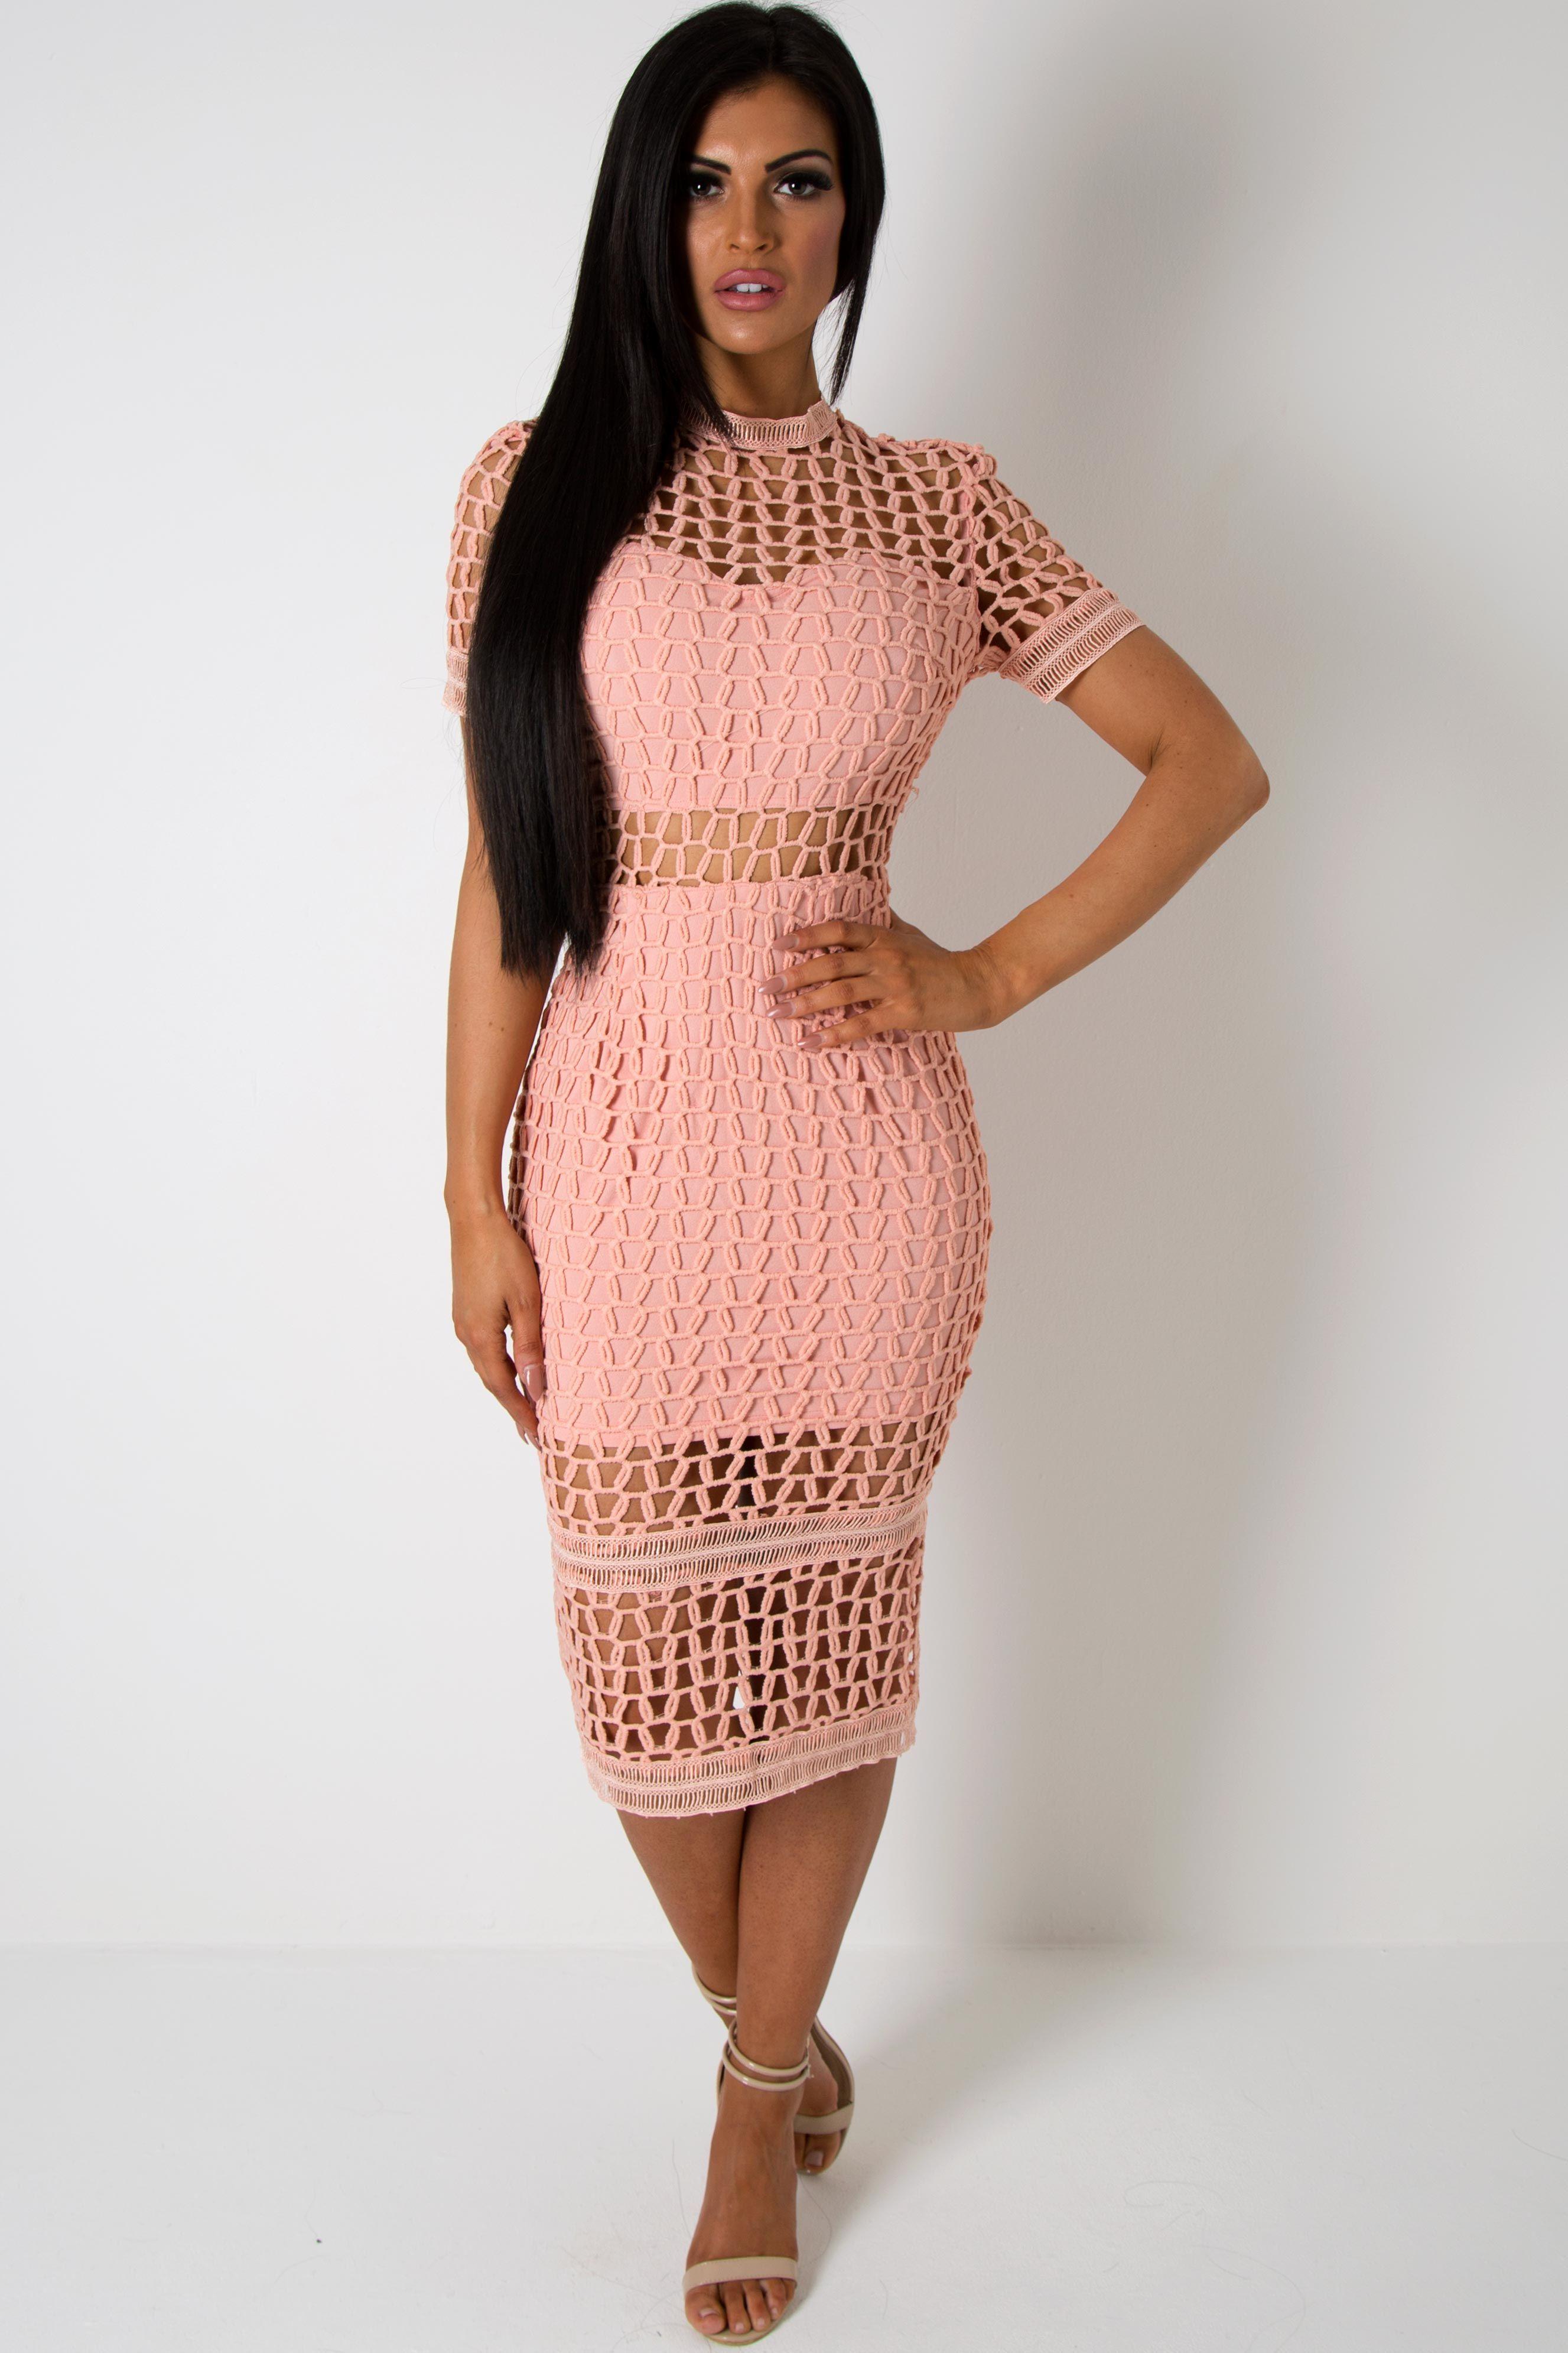 Alaina Pink Polkadot Playsuit   Pink Boutique - Pink